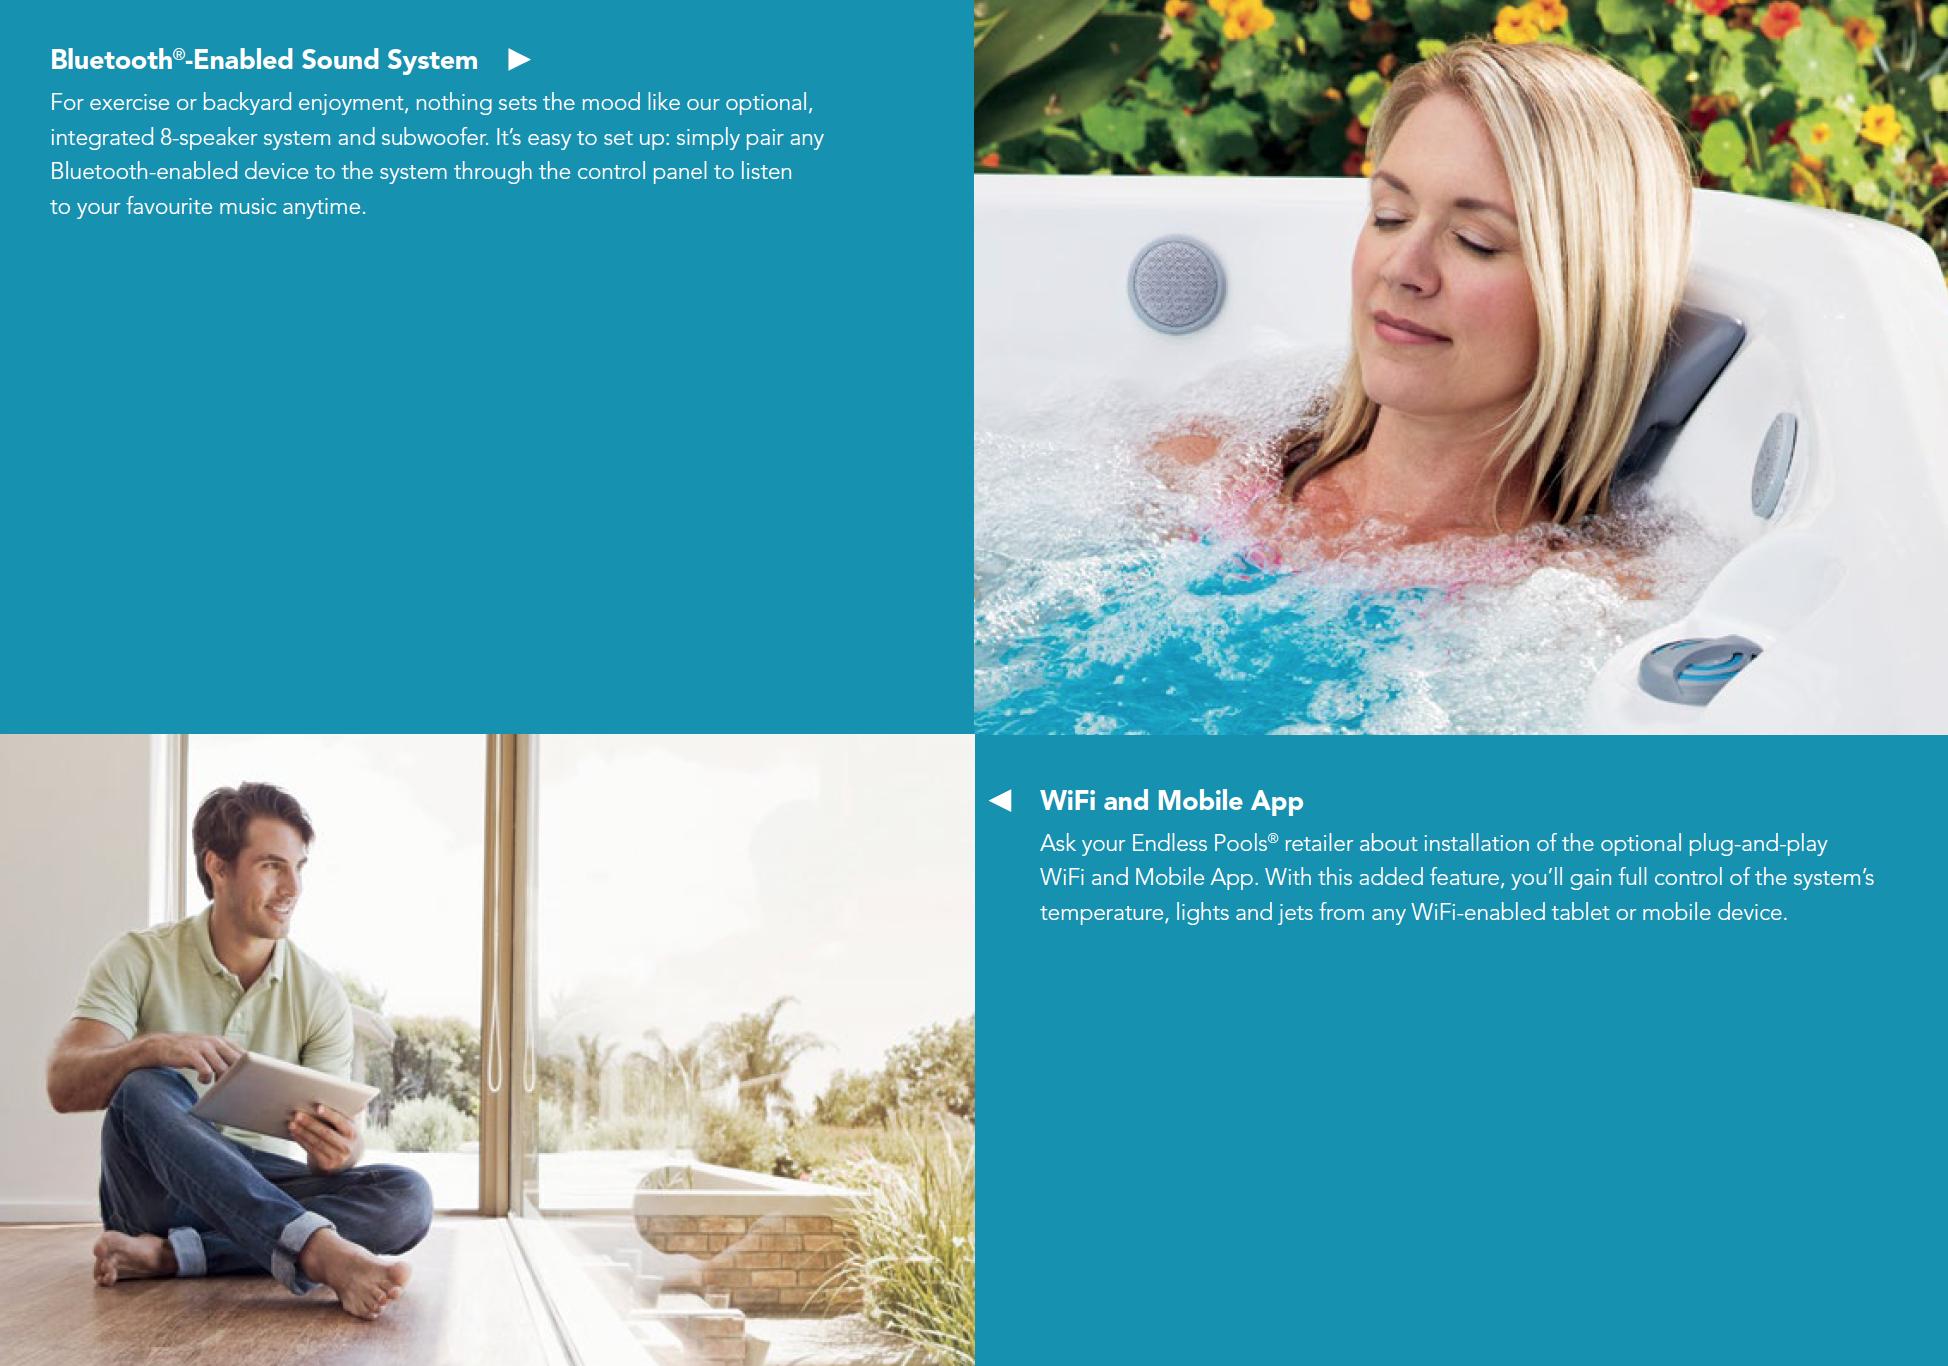 swim-spa-nz-endless-pools-2020-04-18-at-9.55.06-am-5.png